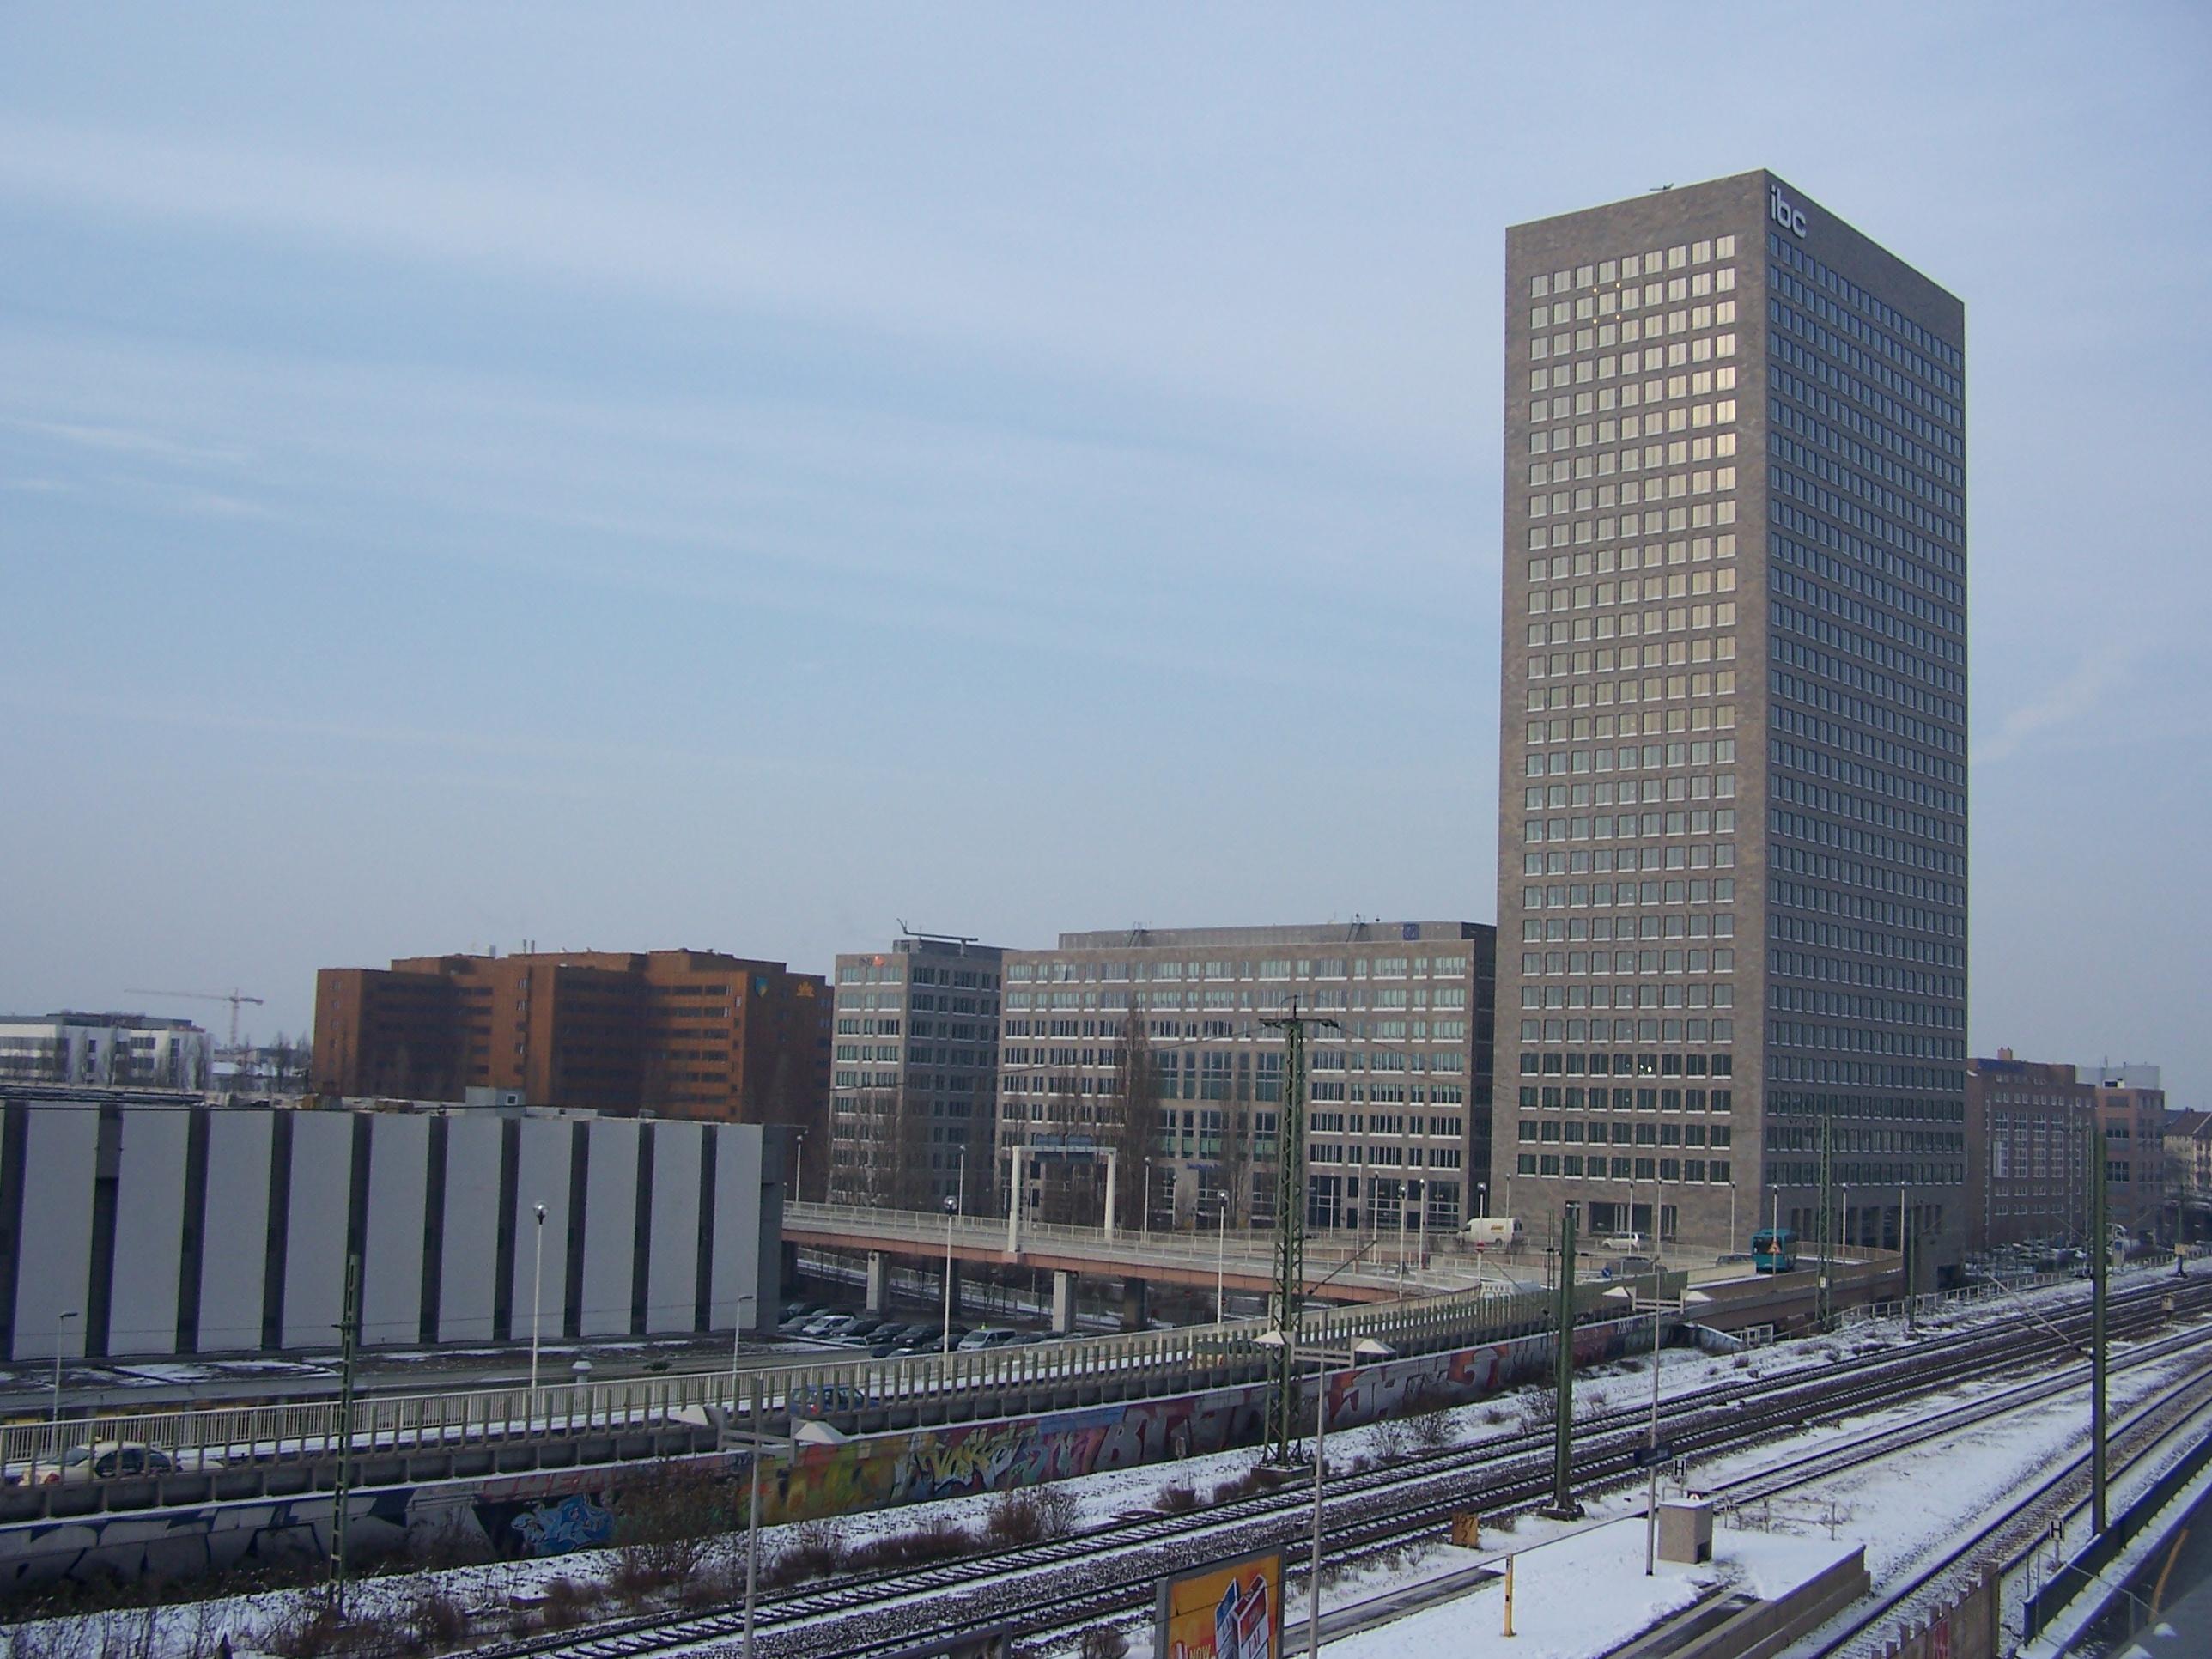 FileInvestment Banking Center Frankfurt, Emser Brückejpg